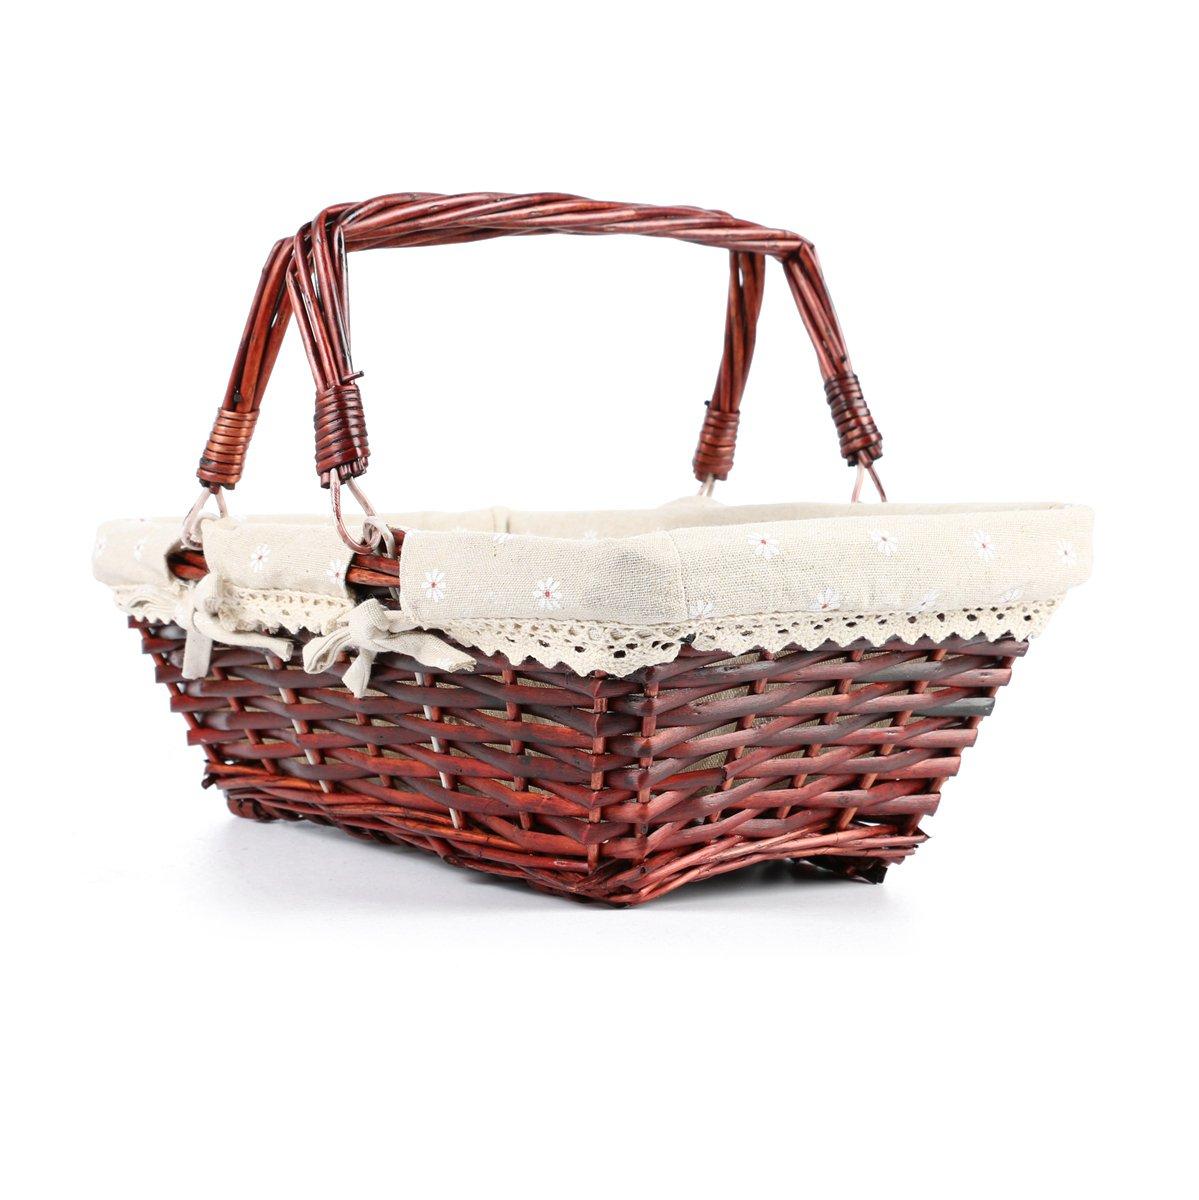 MEIEM Wicker Basket Gift Baskets Empty Rectangular Willow Woven Picnic Basket Easter Candy Basket Large Storage Basket Wine Basket with Handle Egg Gathering Wedding Basket (Brown) by MEIEM